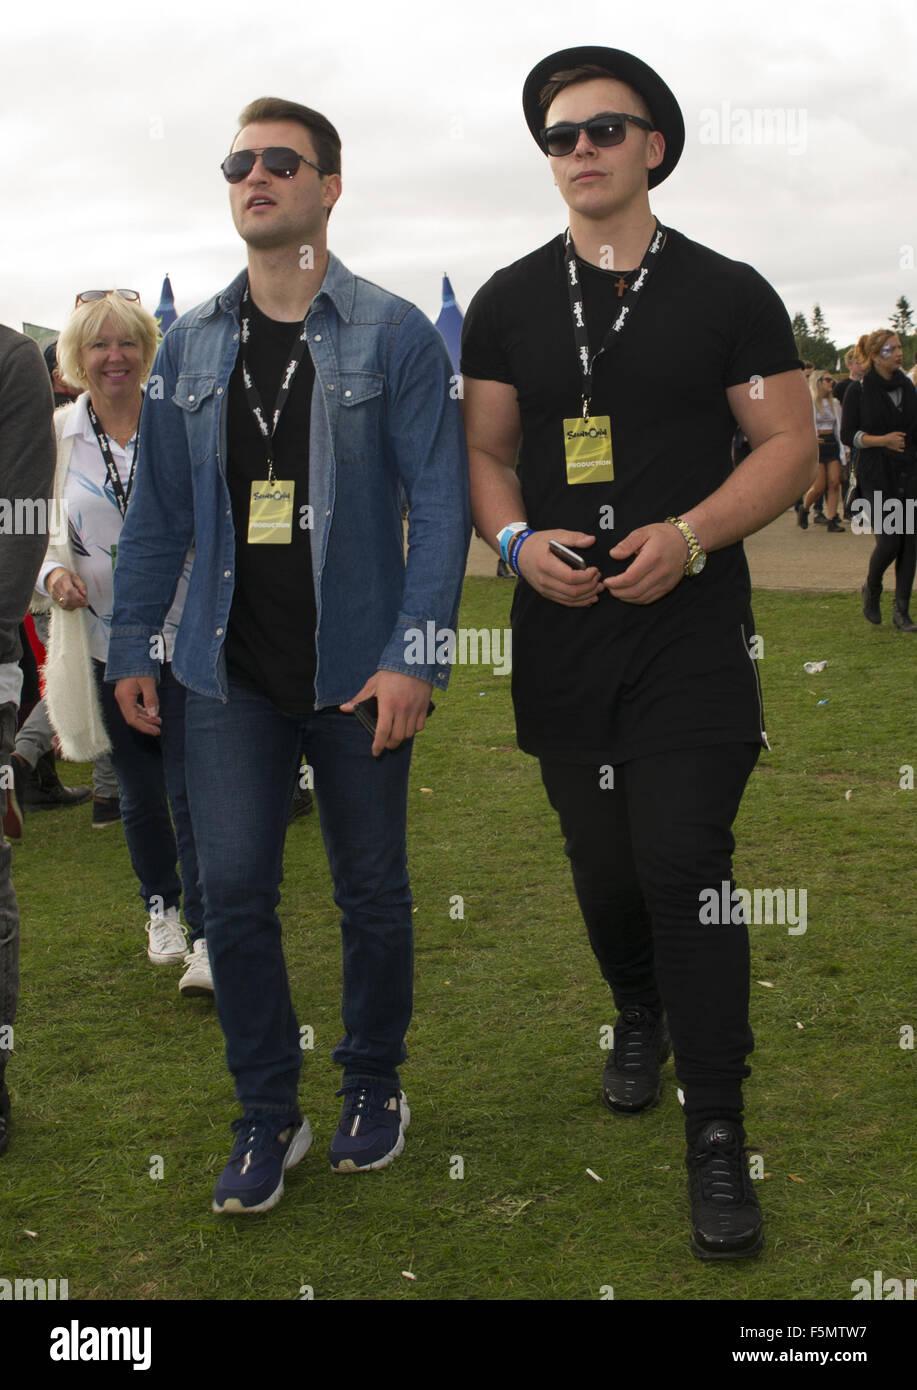 Celebrities at Sundown Festival  Featuring: jack jones Where: Norwich, United Kingdom When: 05 Sep 2015 - Stock Image